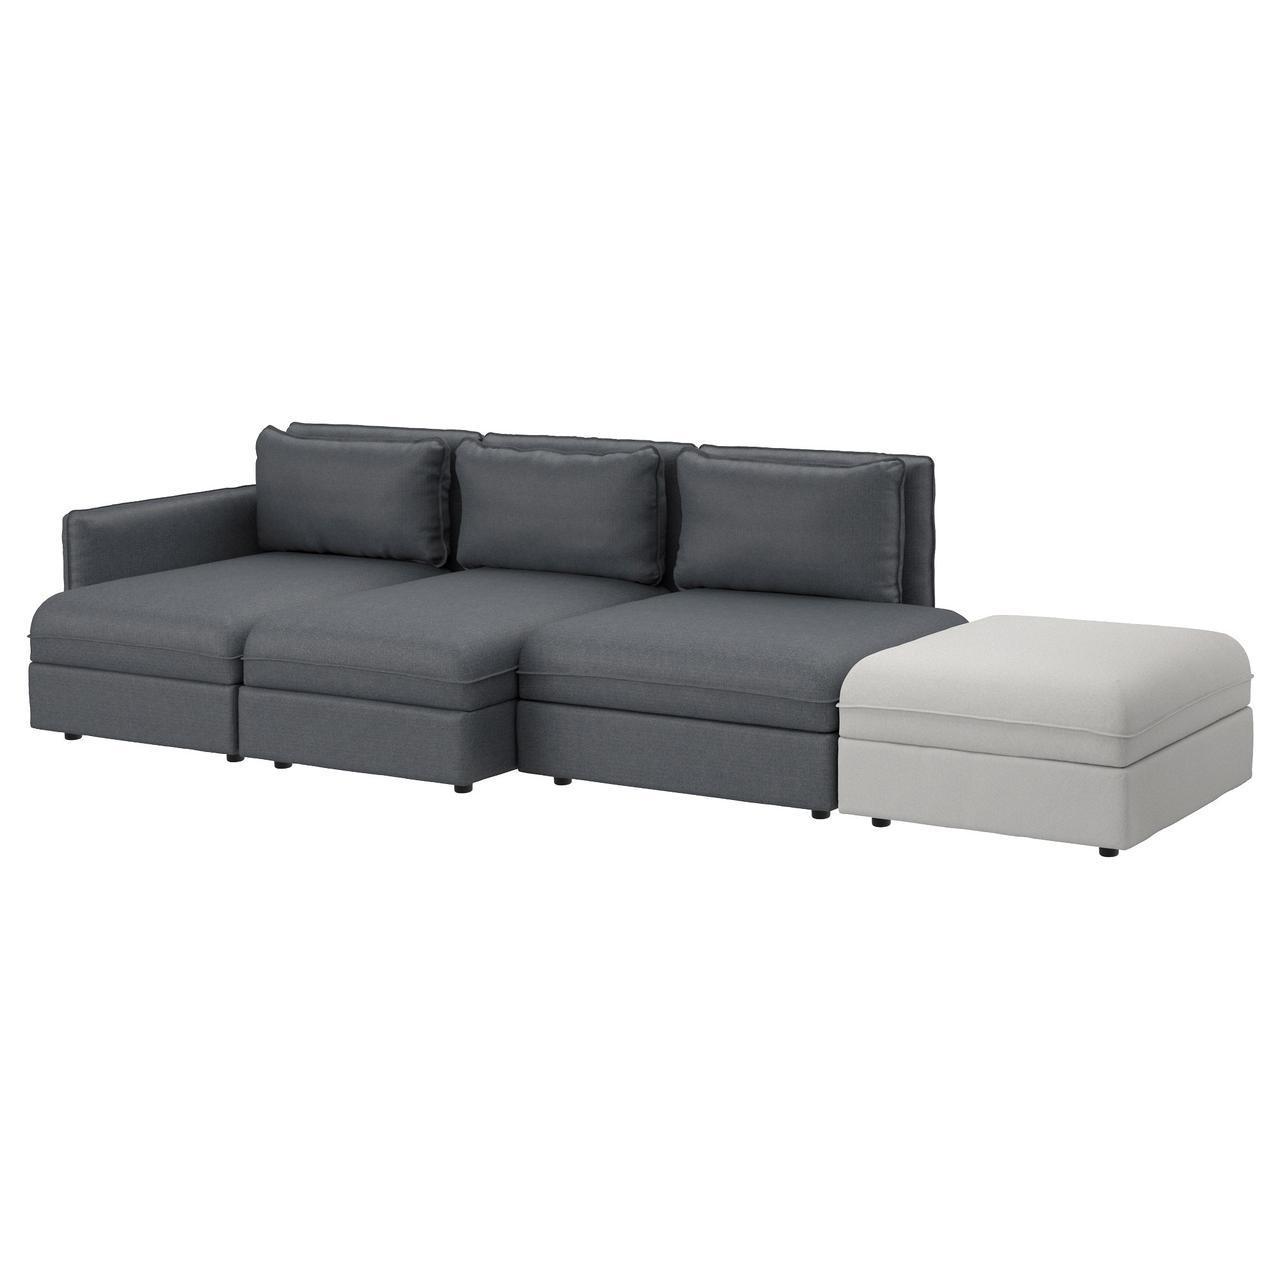 IKEA VALLENTUNA (191.613.85) Диван, 4 части, Murum черный